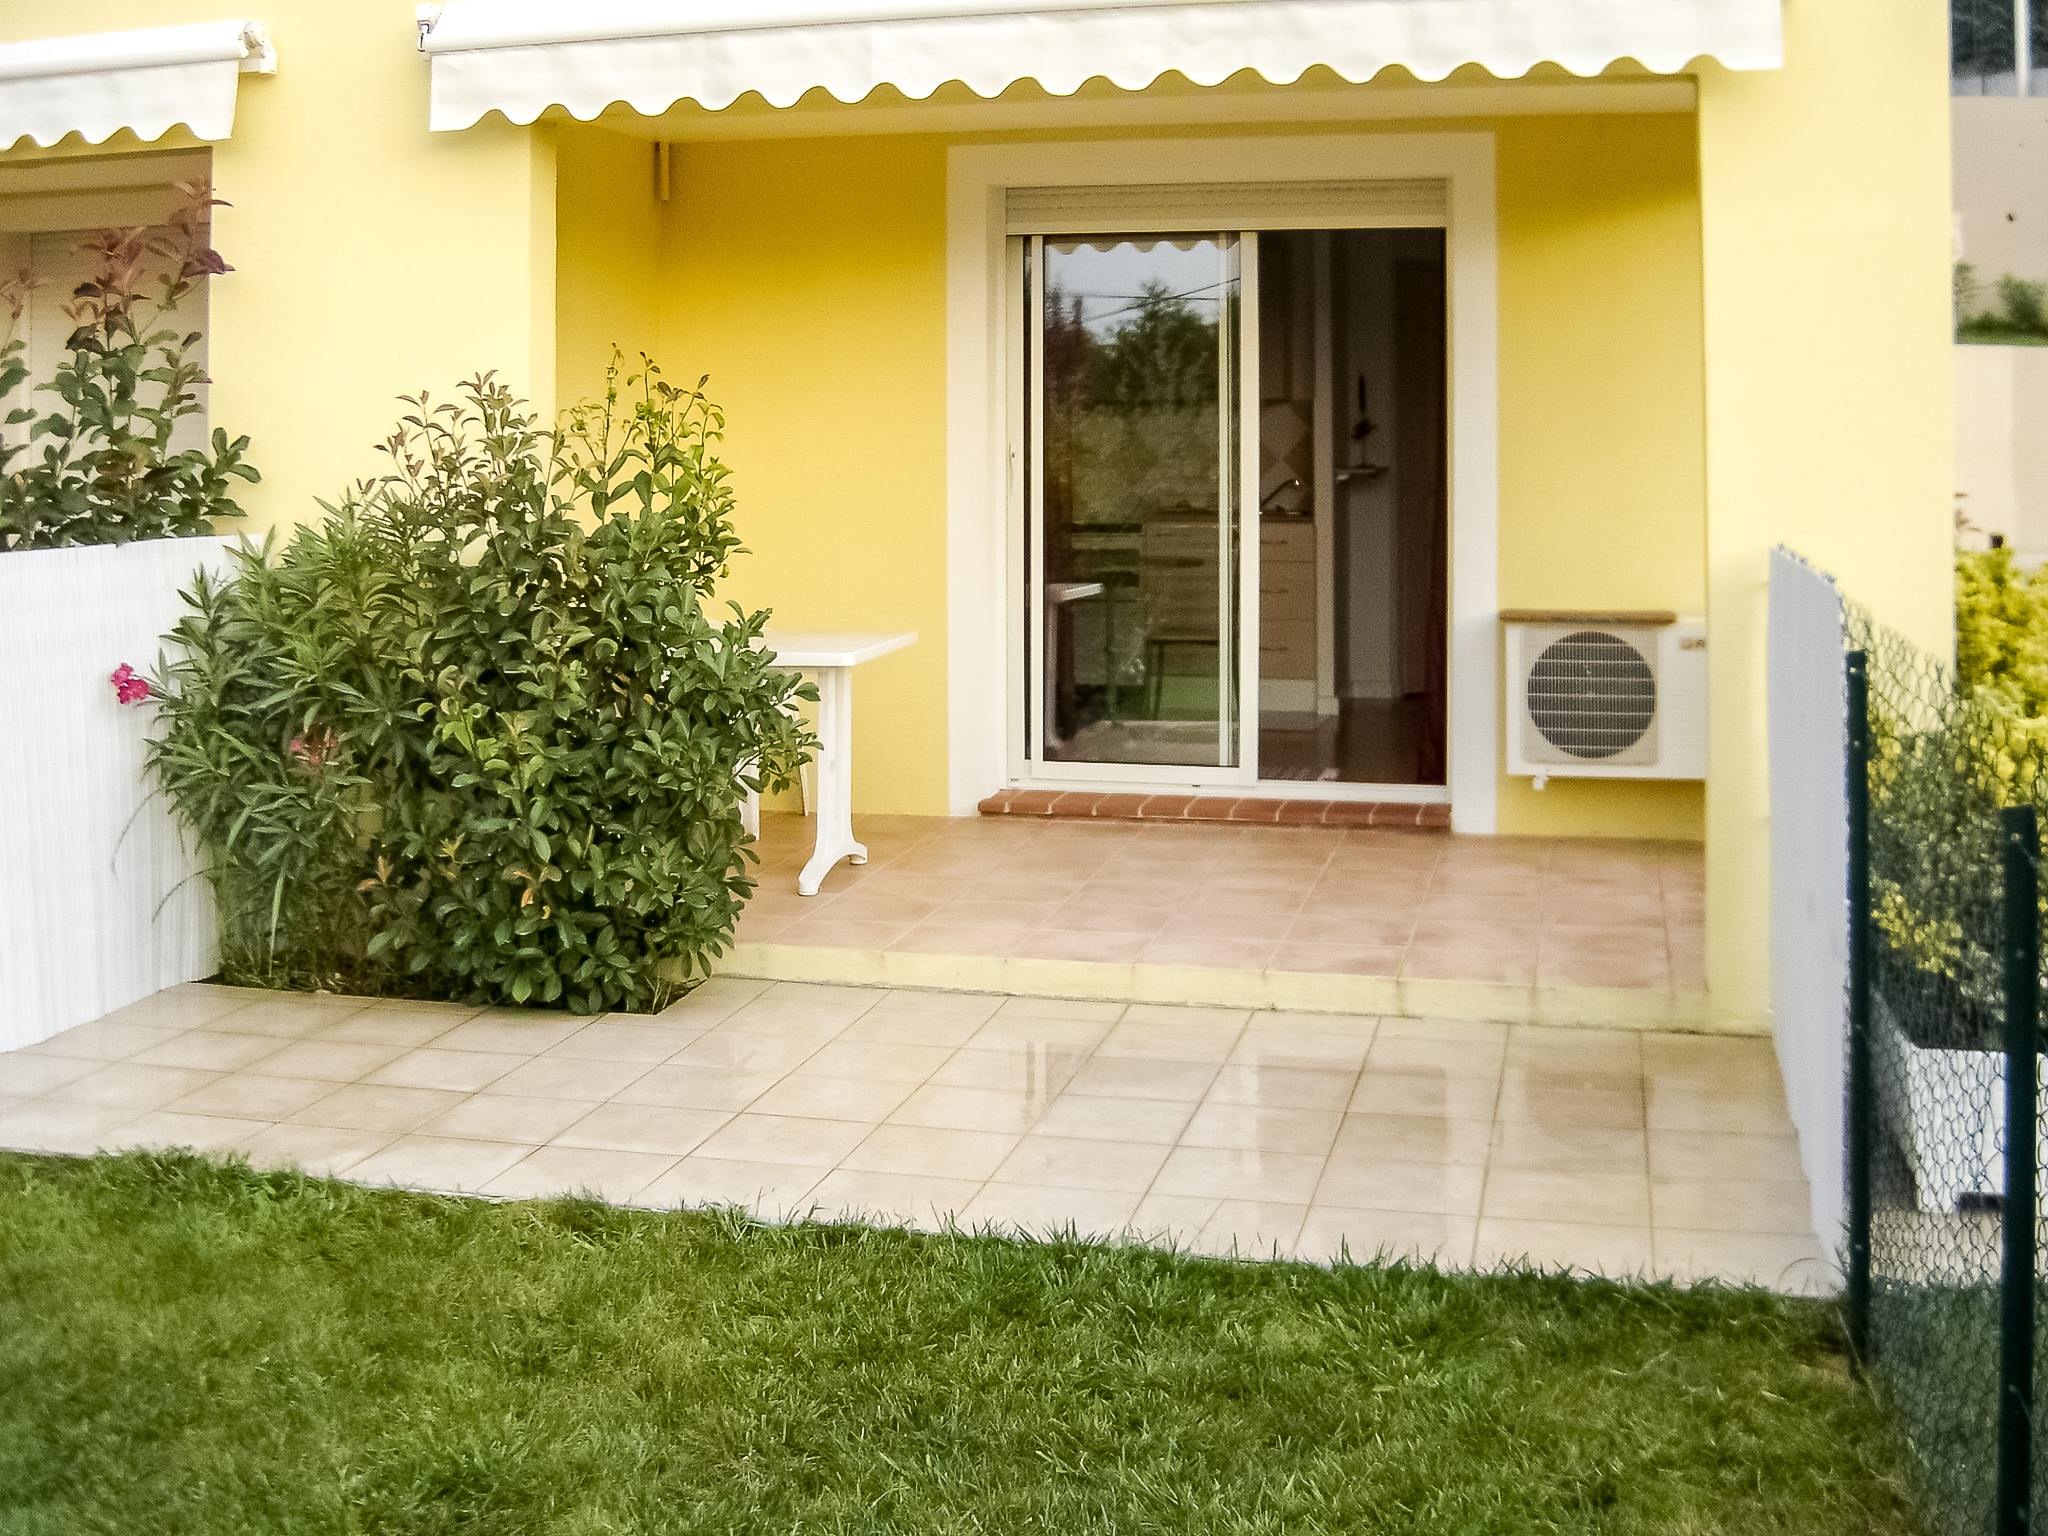 Location T2 terrasse & parking – rdc villa – Cagnes-sur-mer